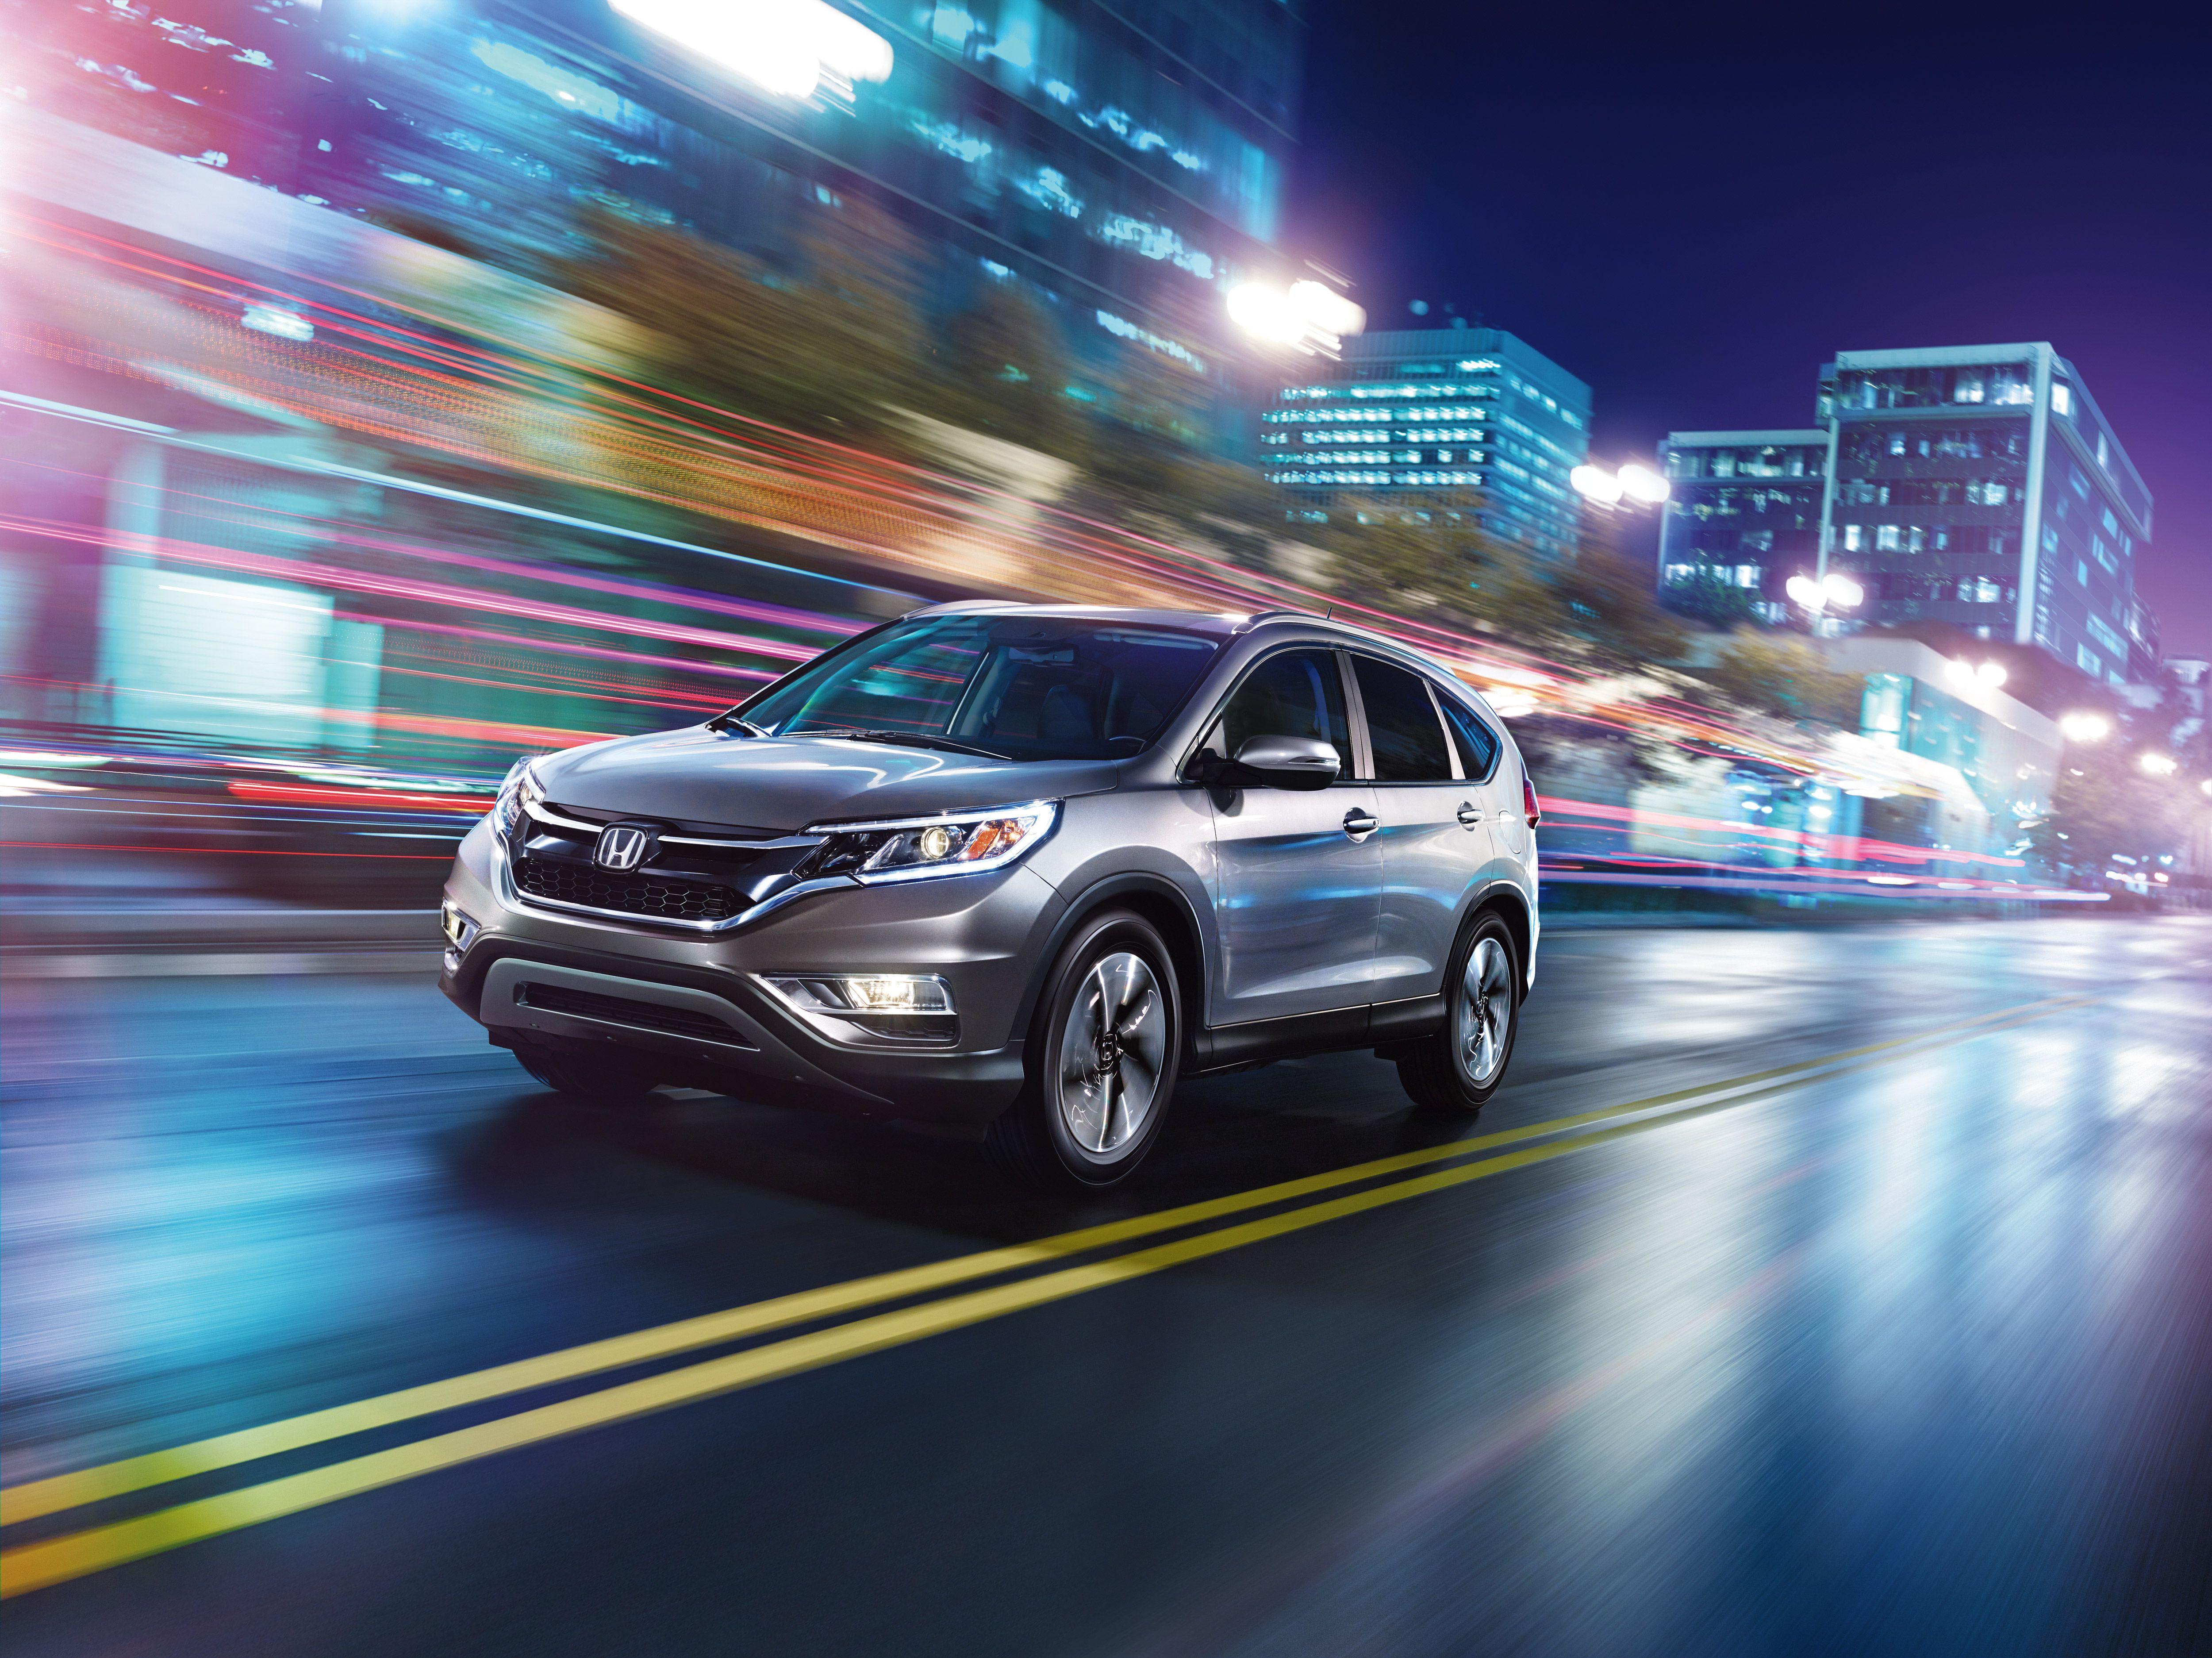 Honda CRV Fundamentals Set a New Bar for Excellence